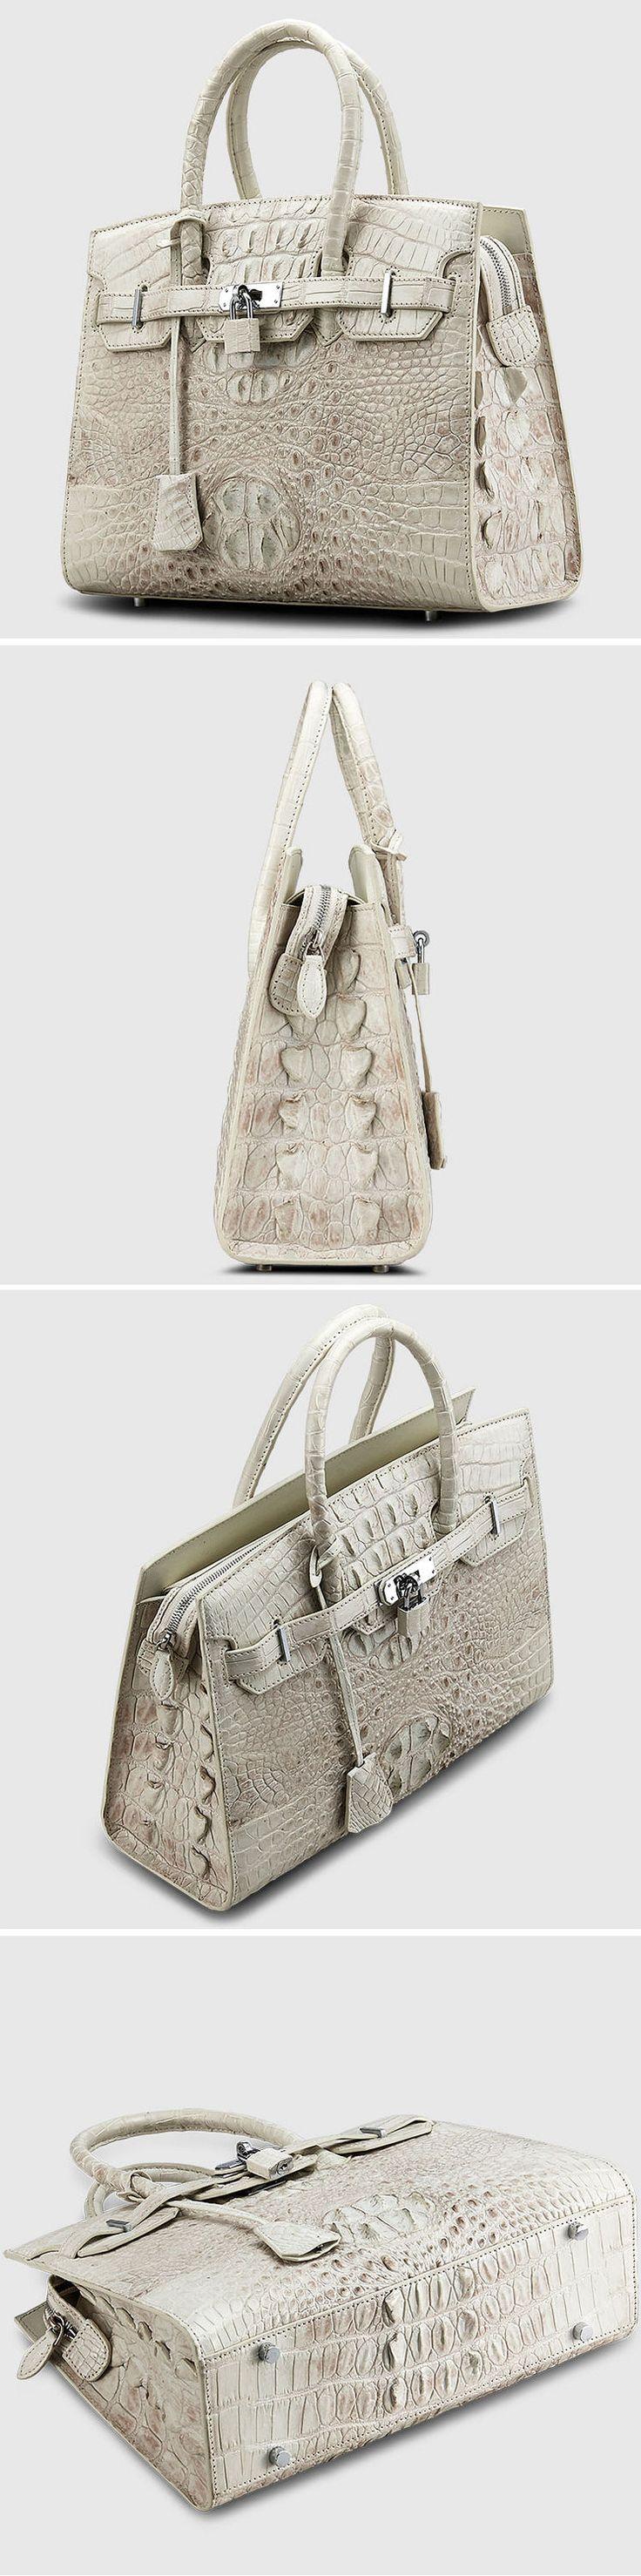 Crocodile Handbag, Crocodile Purse, Luxury Crocodile Handbag